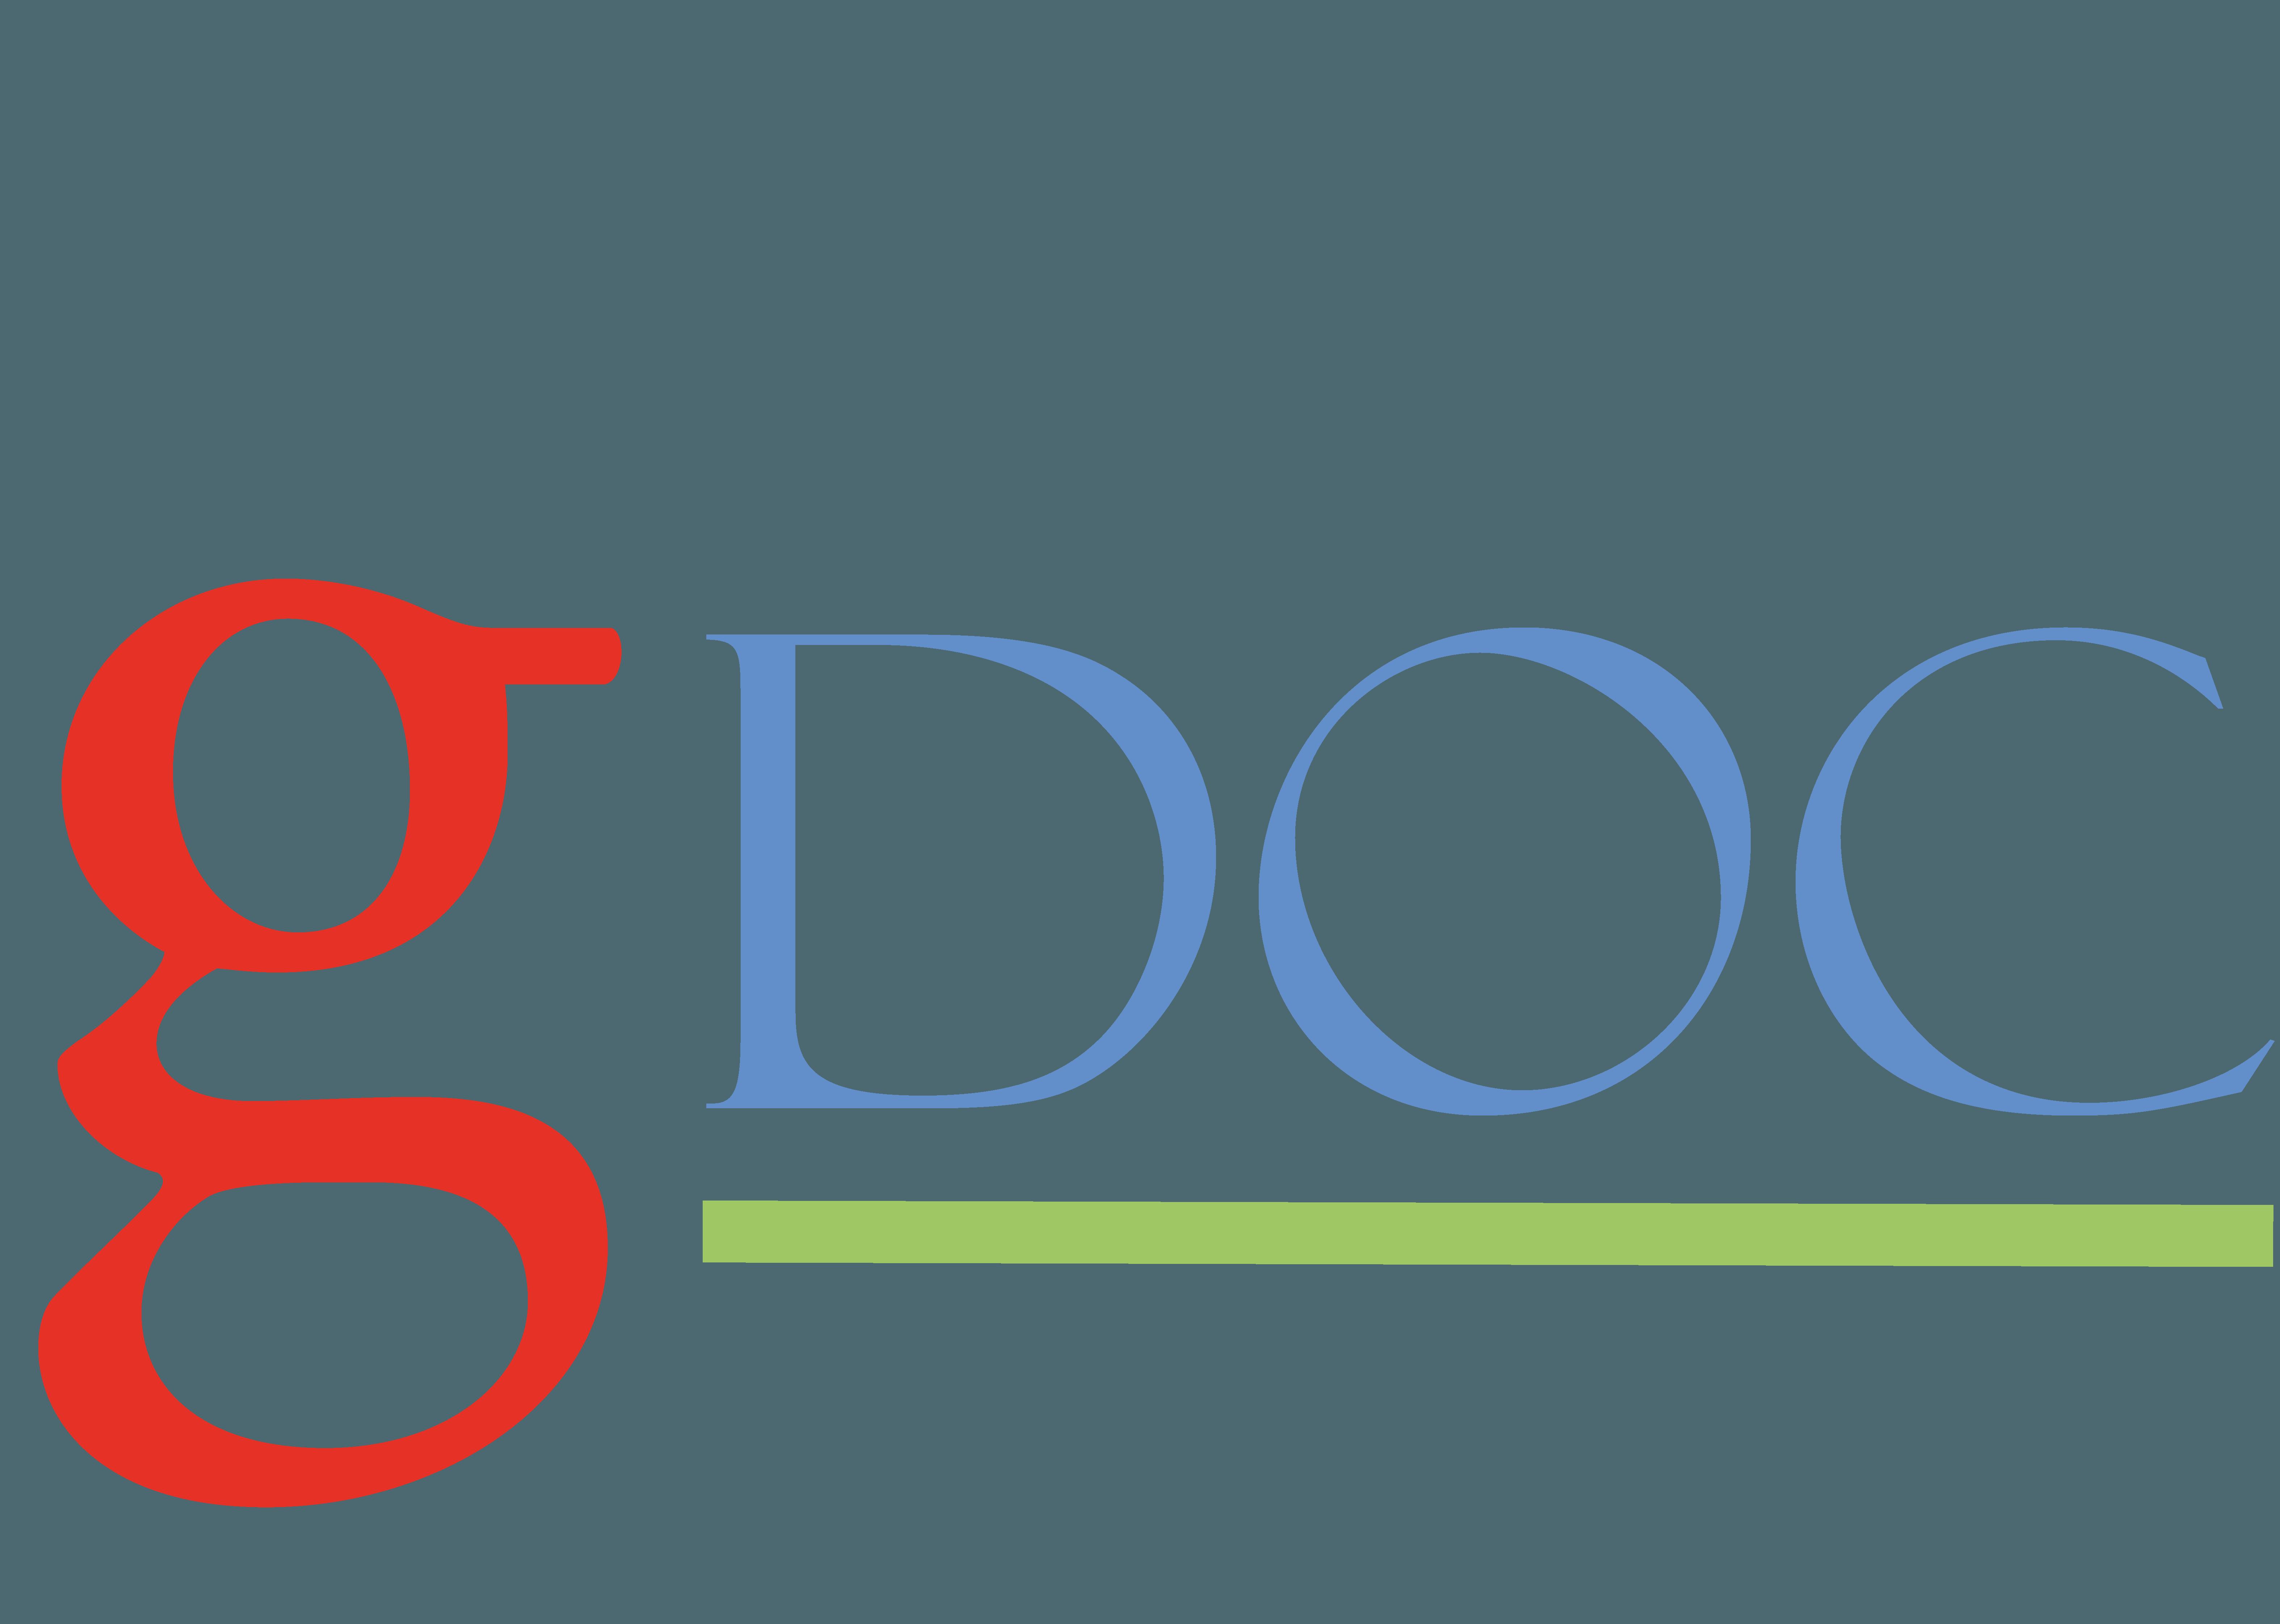 GDoc - Gloucestershire's GP Cooperative